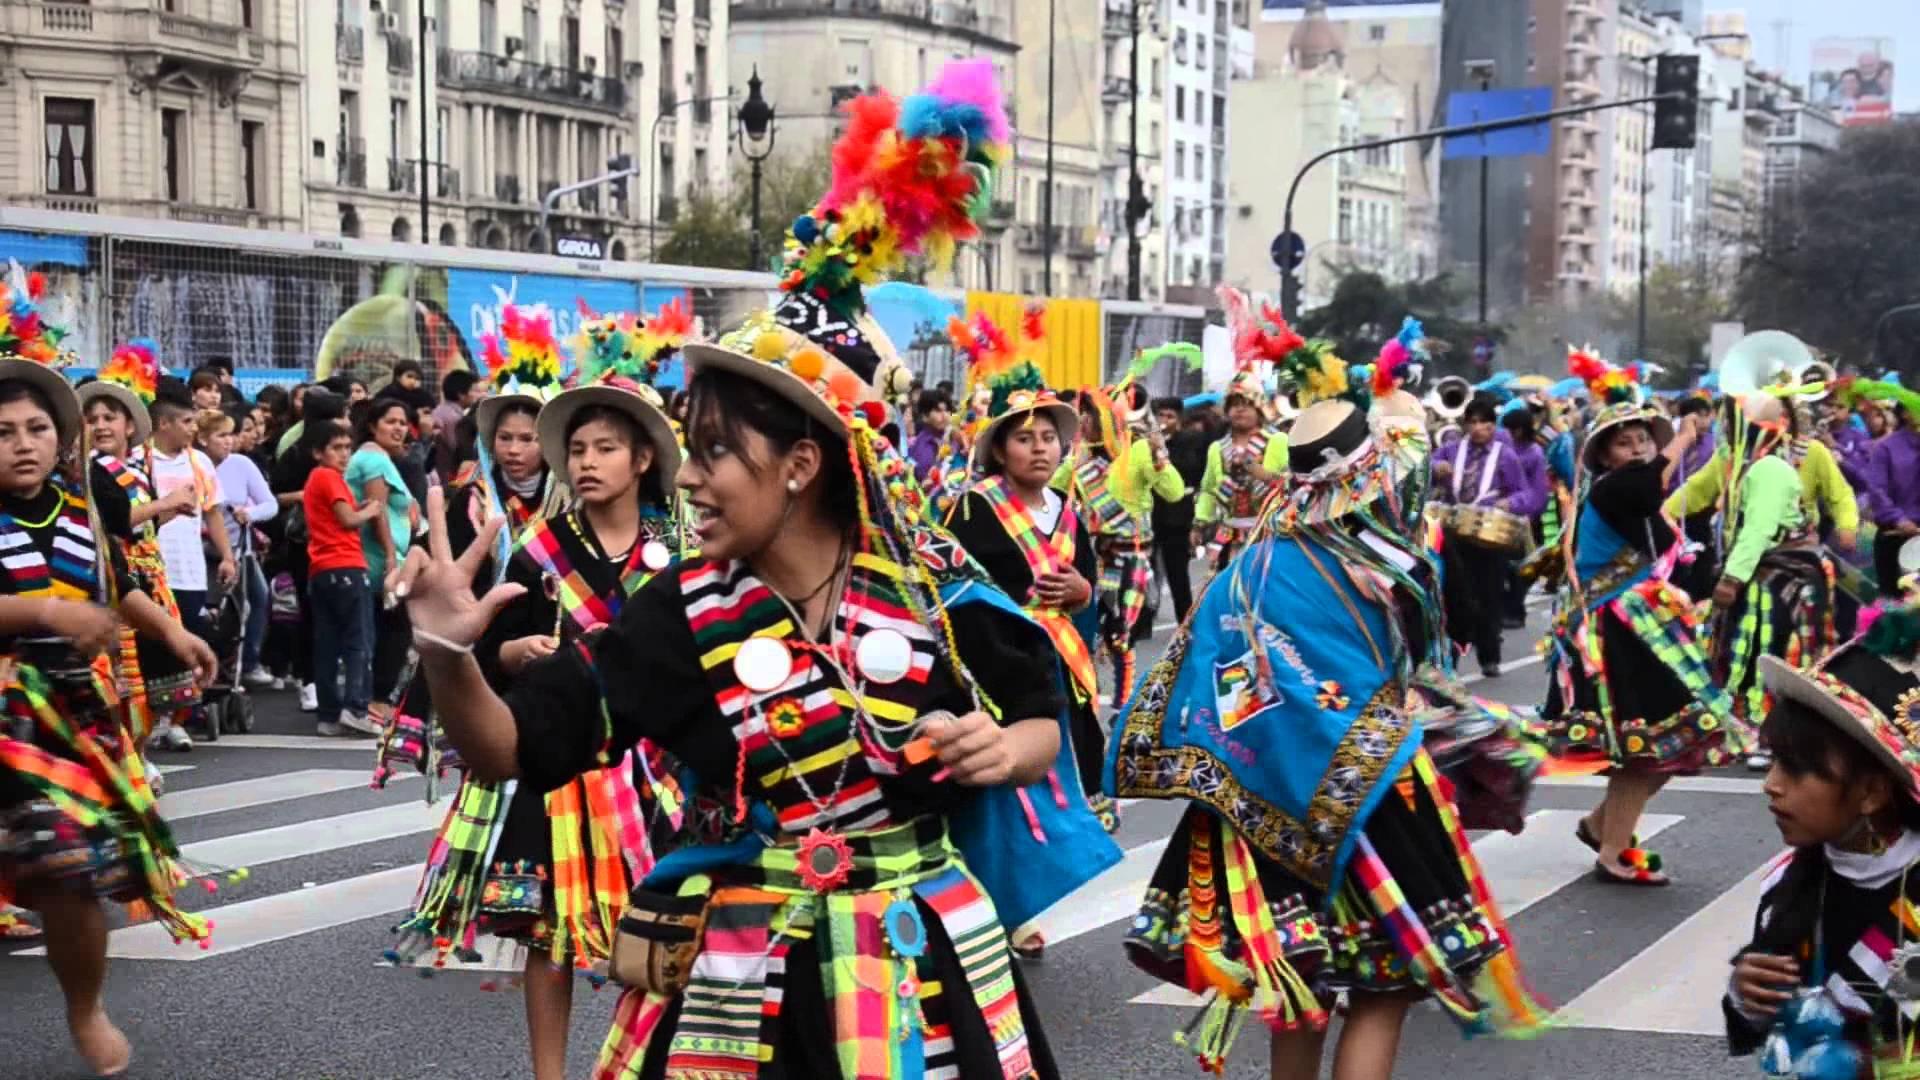 Buenos aires celebra cultura boliviana con danza Chimentos dela farandula argentina 2016